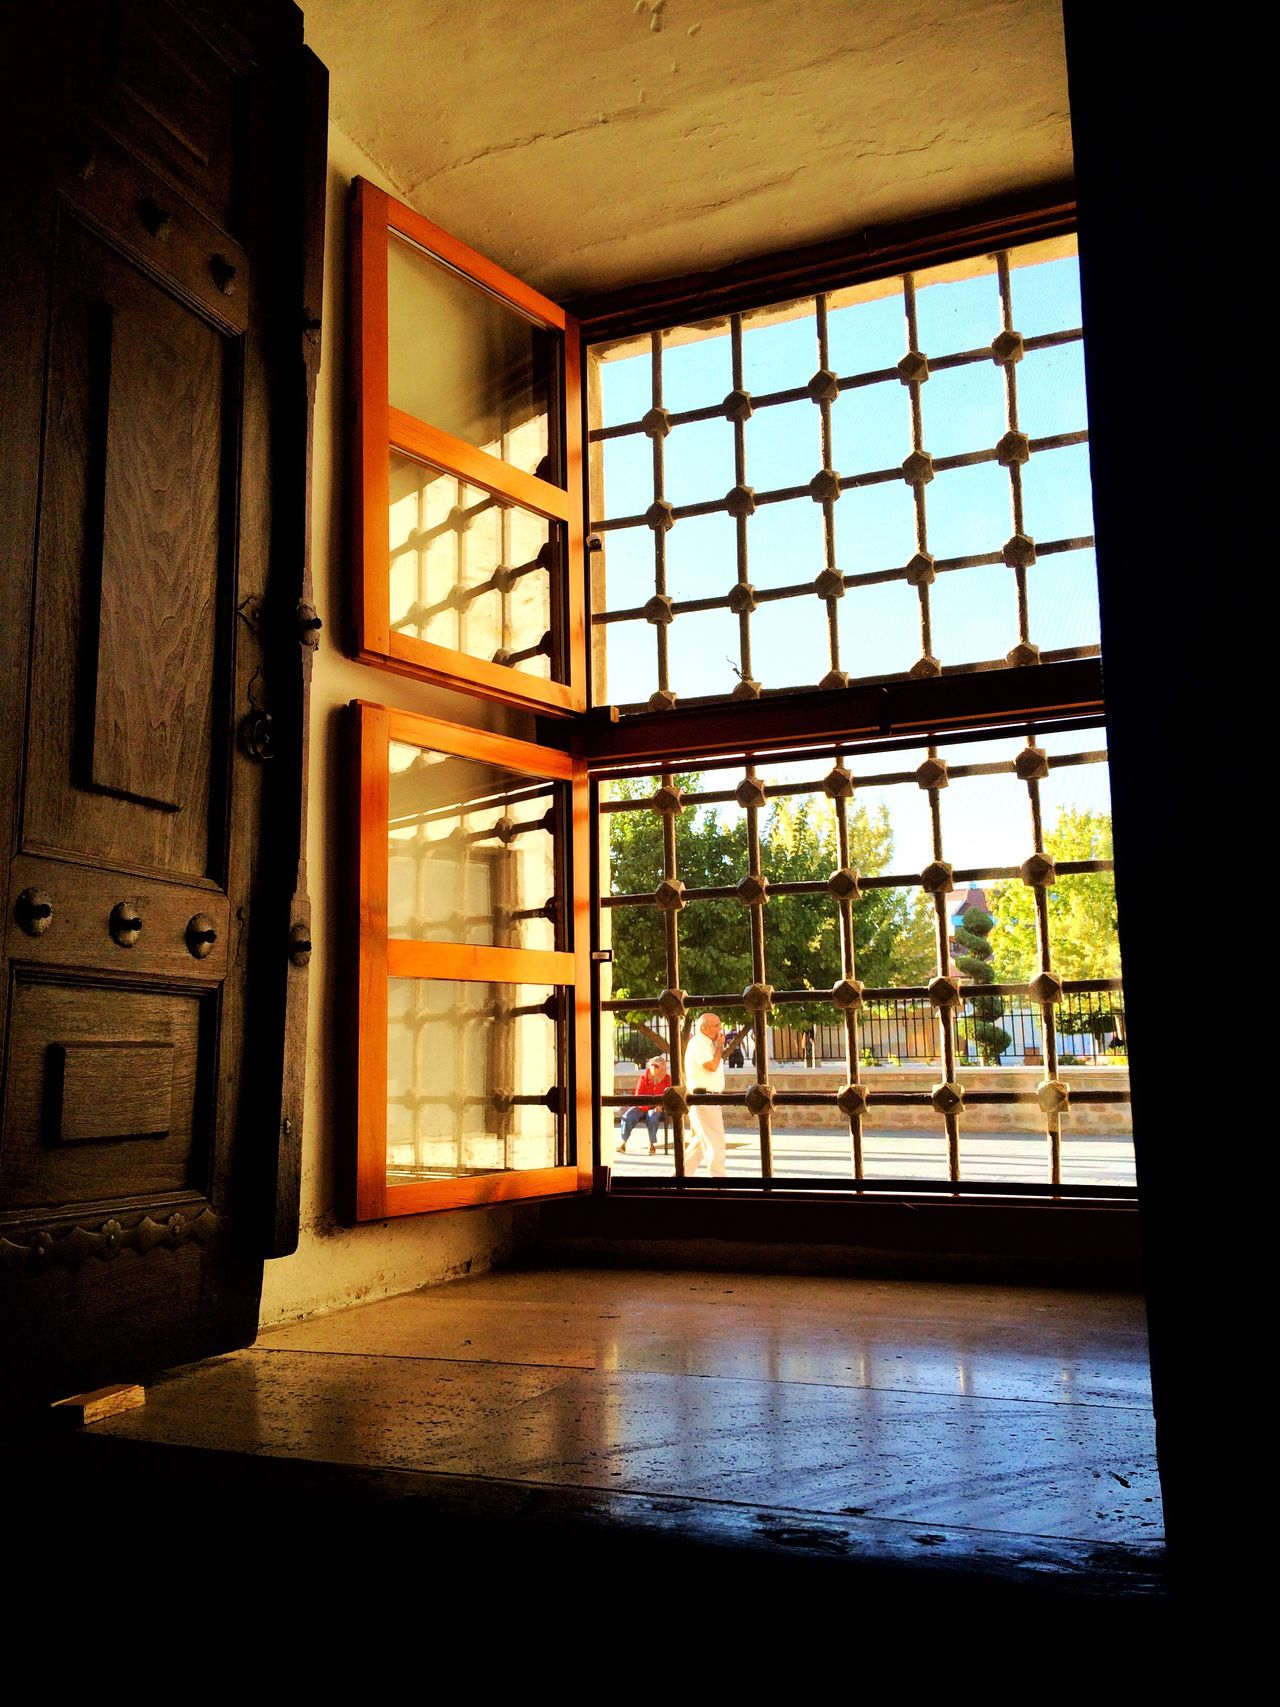 Mosque Konya Window Turkey Retro Elégance No People Architecture Konya Turkey Mevlana Türbesi Mevlana Meydanı Mevlana Mosque